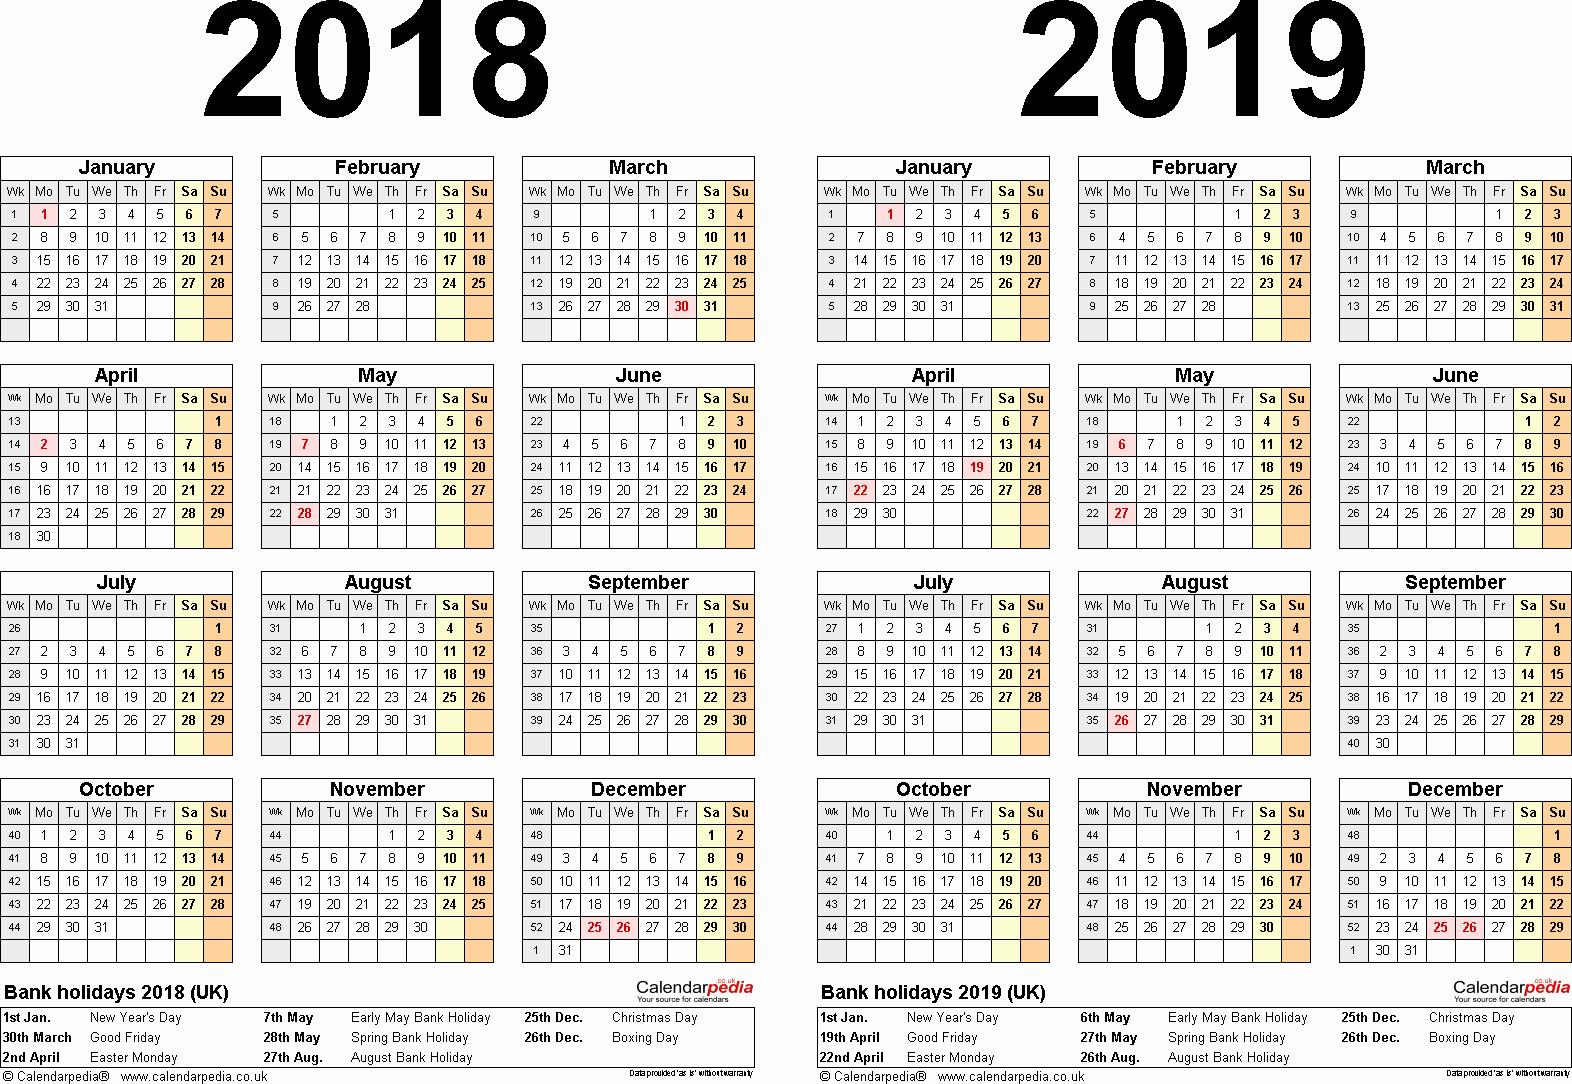 Printable Calendar 2018 and 2019 Luxury June 2019 Calendar with Holidays Uk